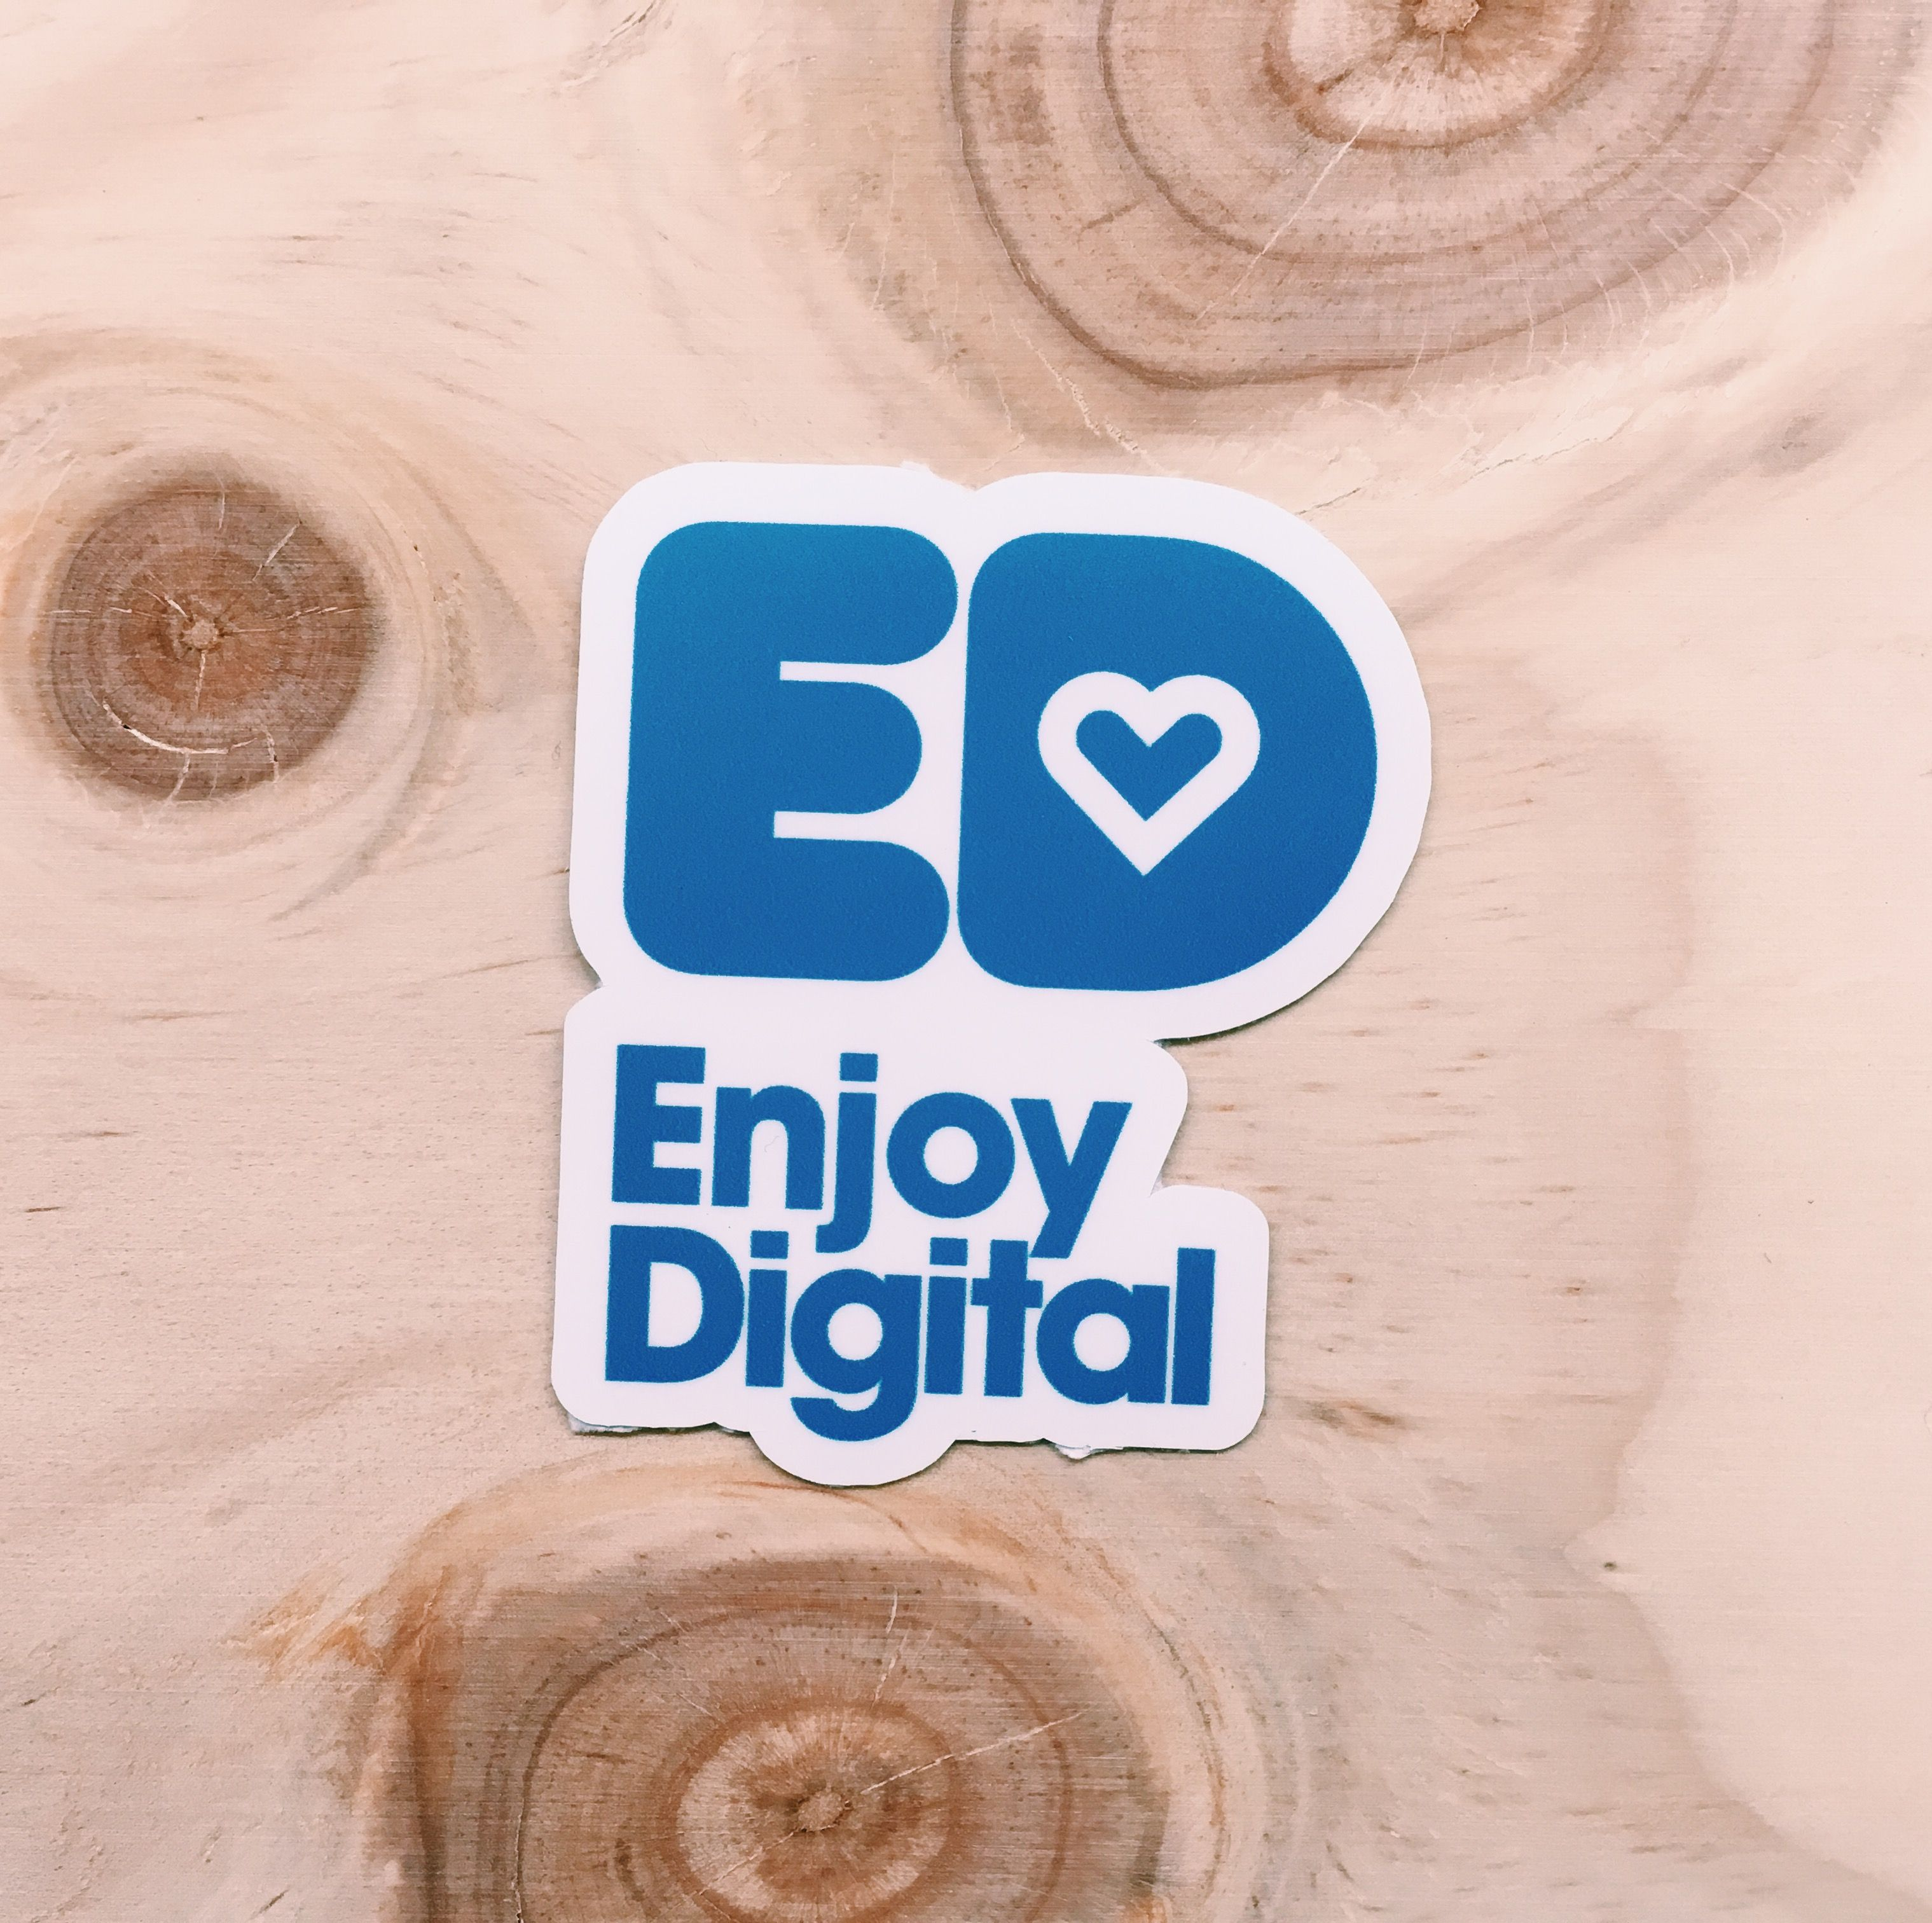 Stickers startupcompany startup startupstickers enjoydigital enjoydigitalleeds leeds leedscreative colour illustration england uk world vinyl